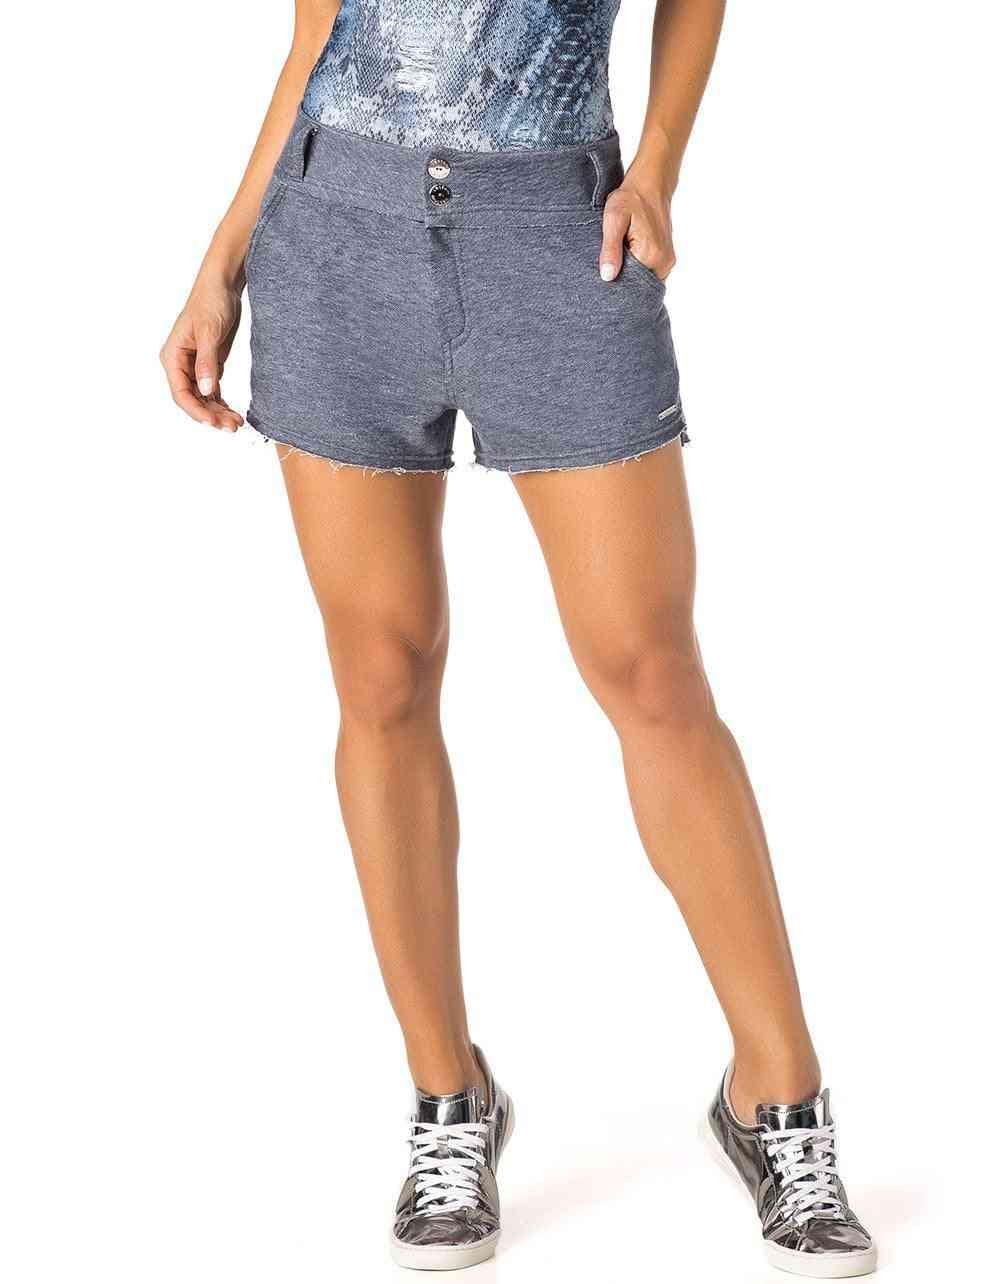 Womens Casual, Cutoff Jeans Shorts